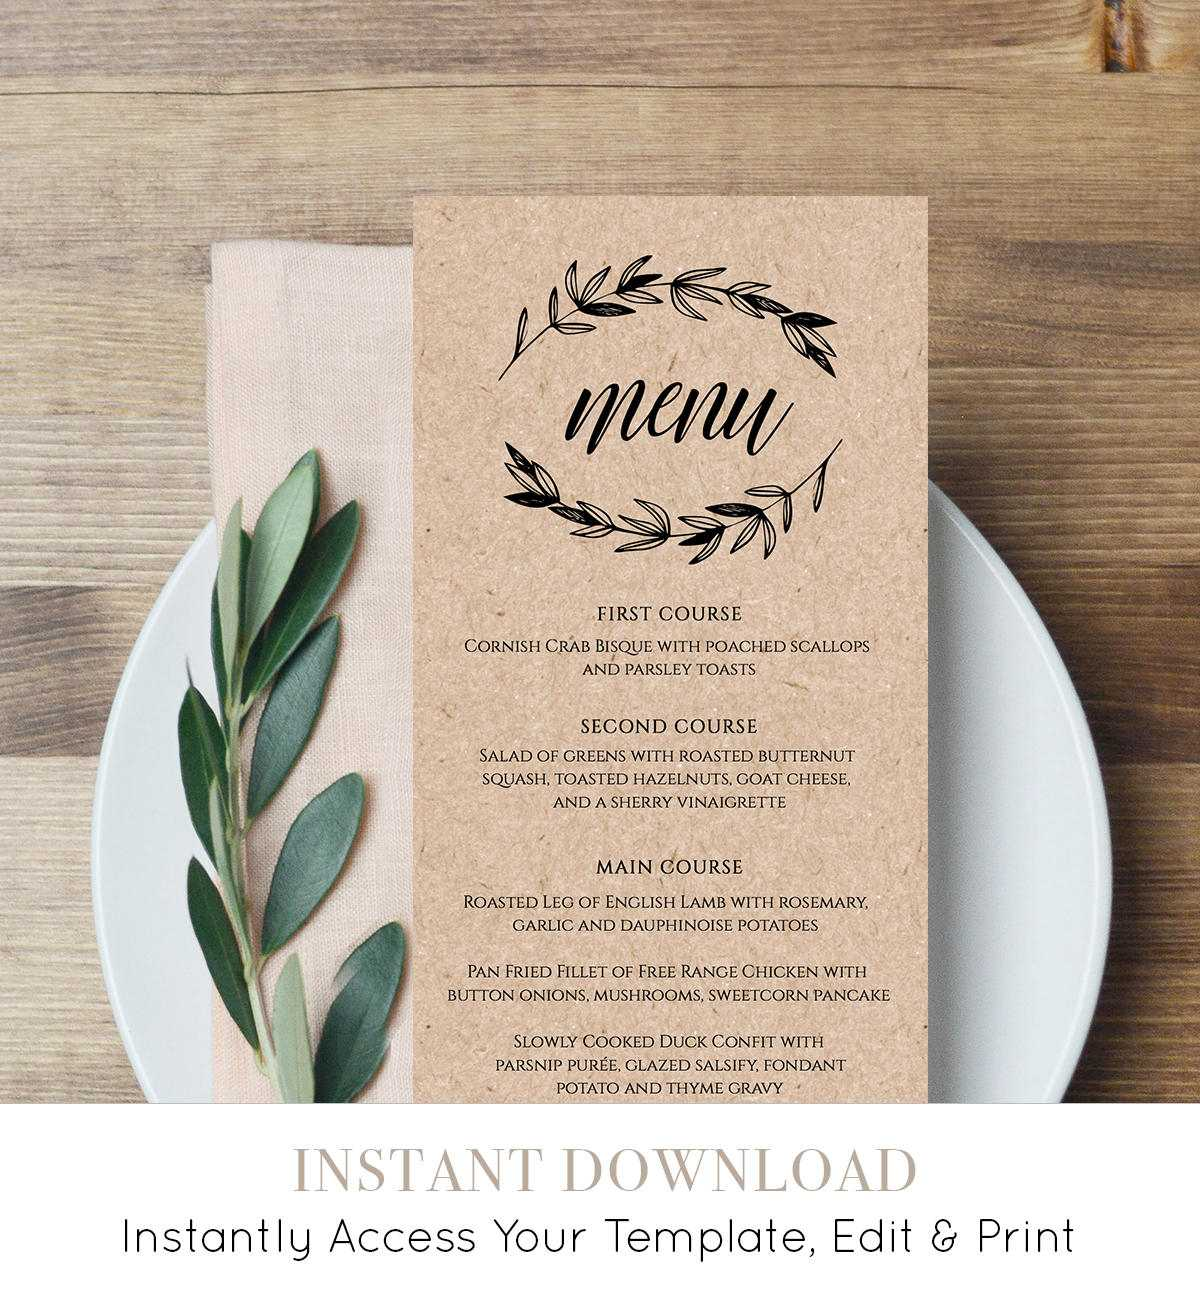 003 Free Wedding Menus Templates Download Il Fullxfull Pertaining To Free Wedding Menu Template For Word